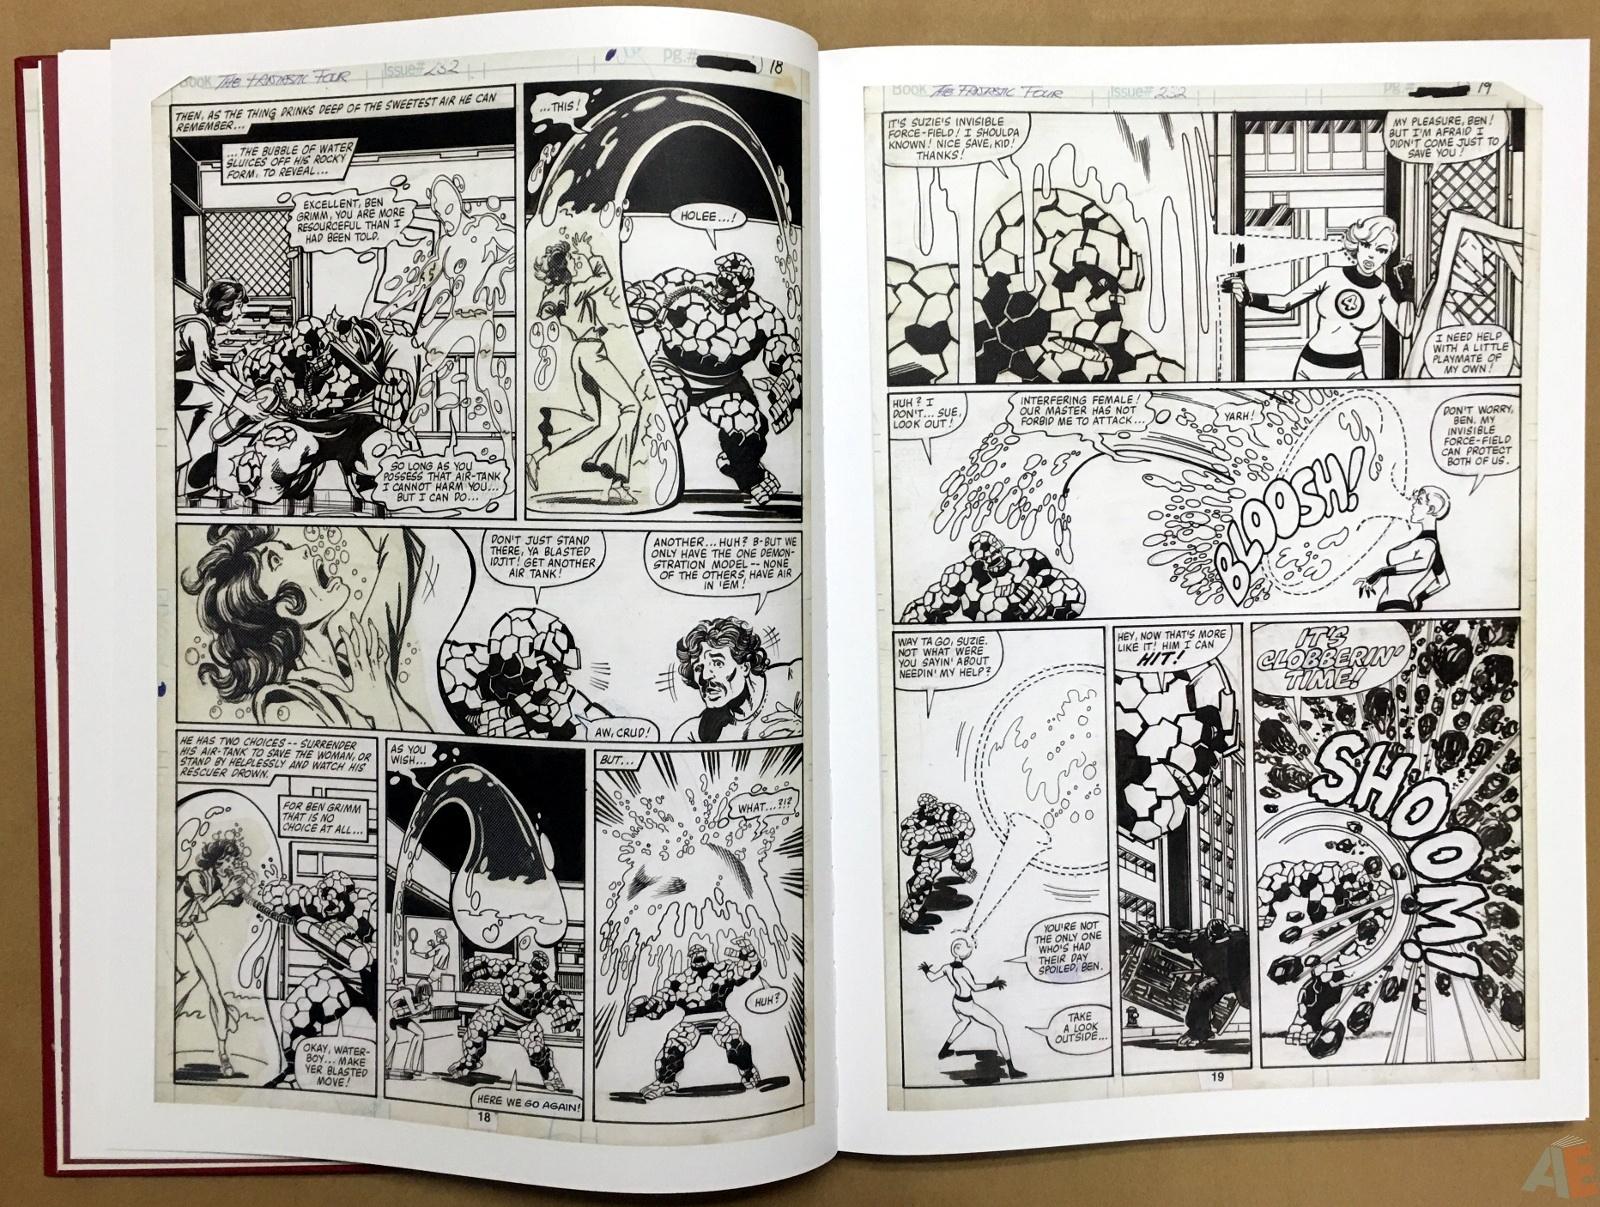 John Byrne's The Fantastic Four Artist's Edition 12